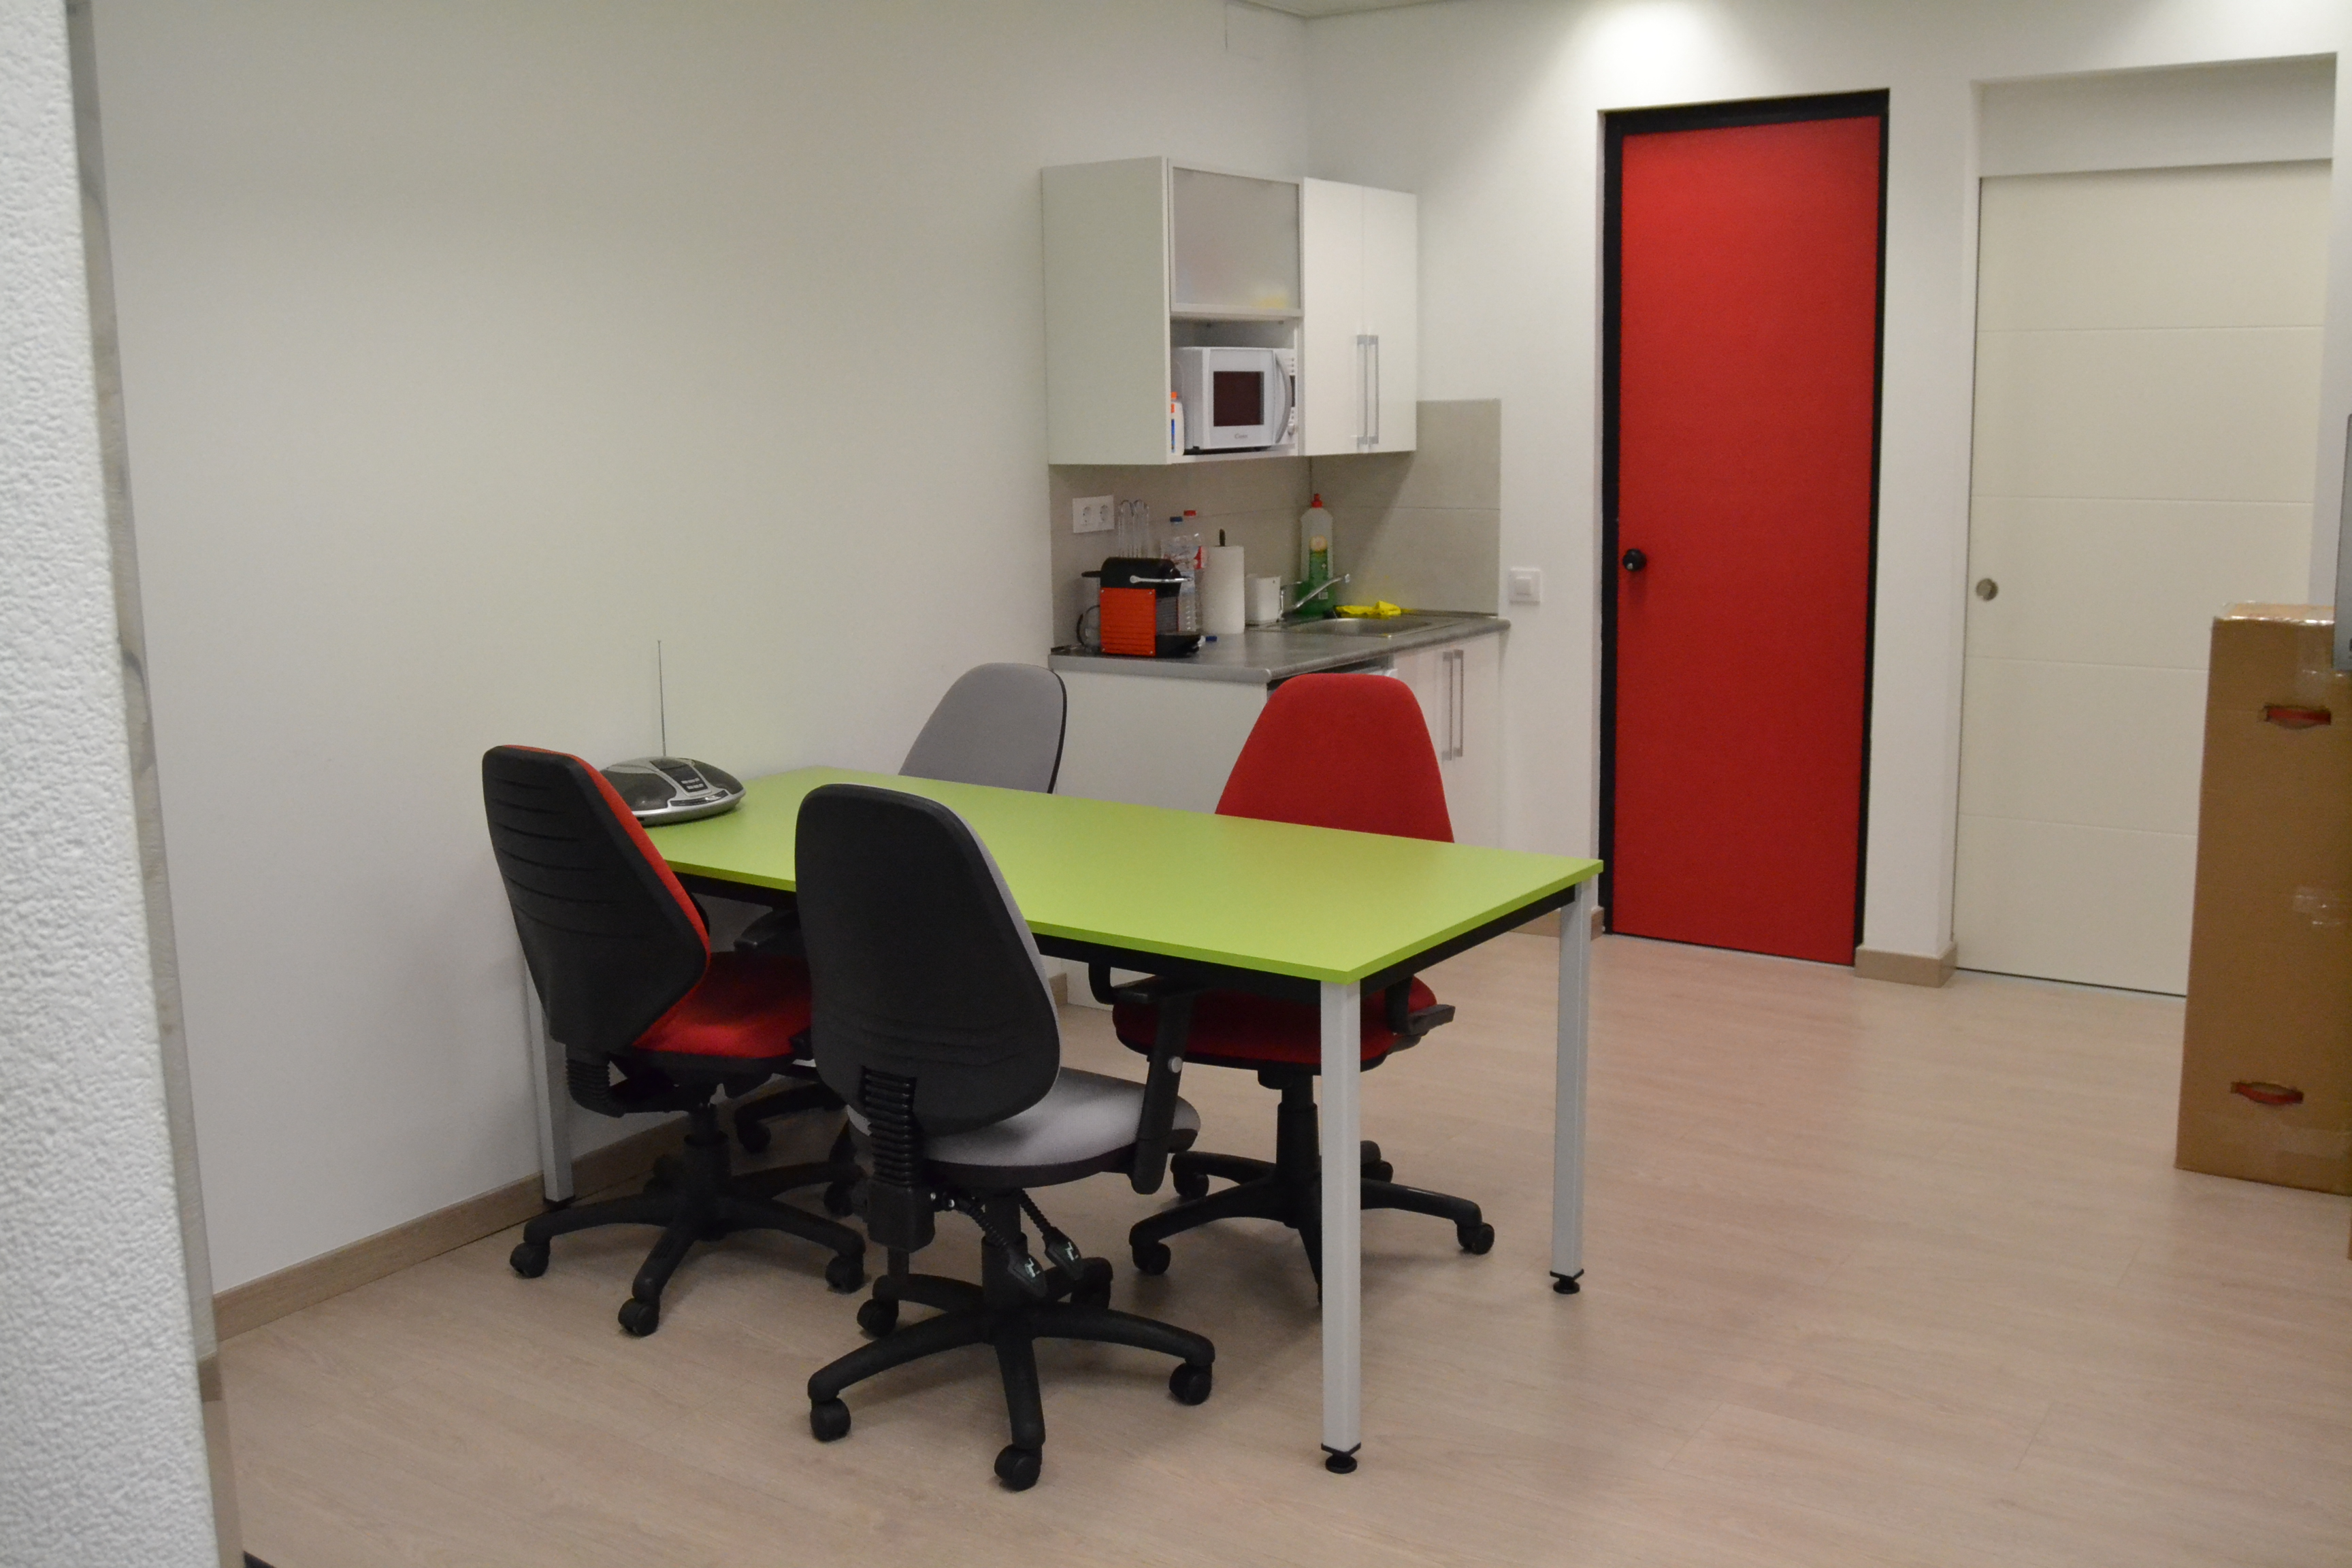 Reforma integral de local para oficina inmobiliaria mini cocina